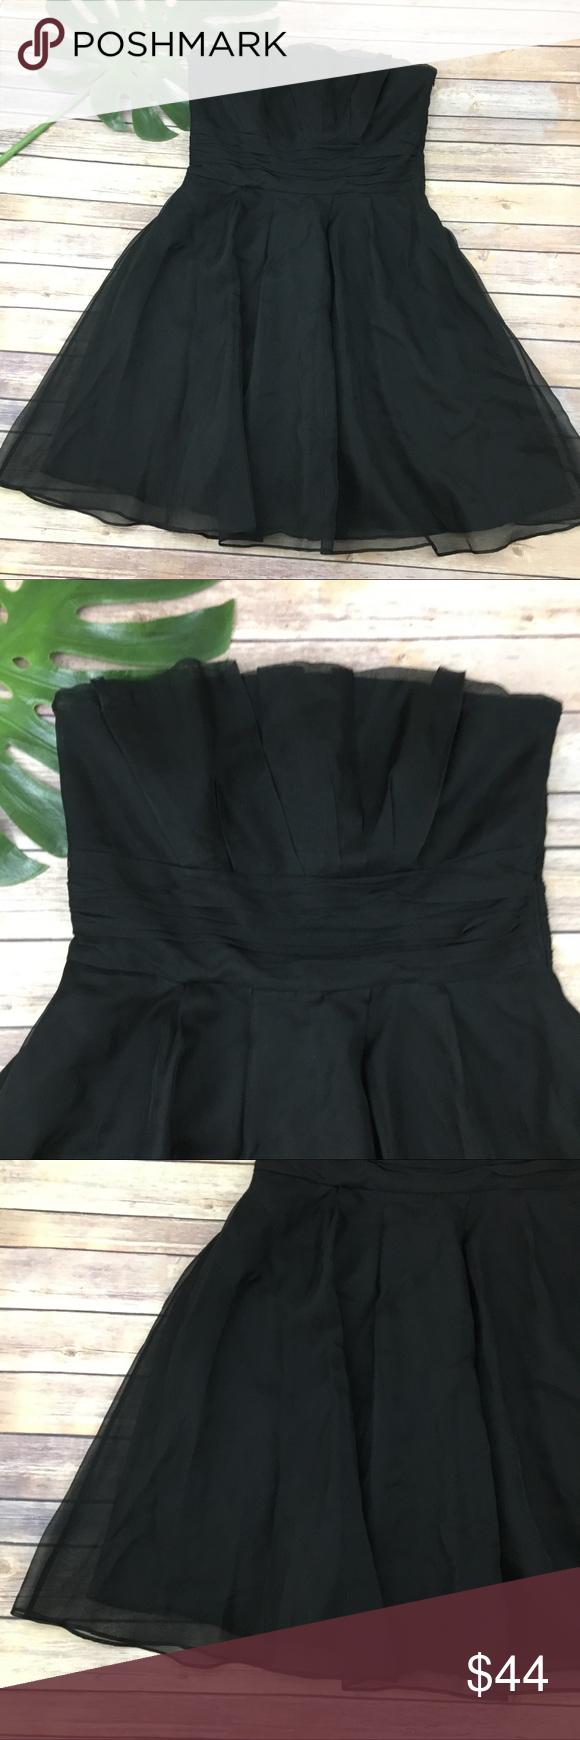 Black strapless dress size 14